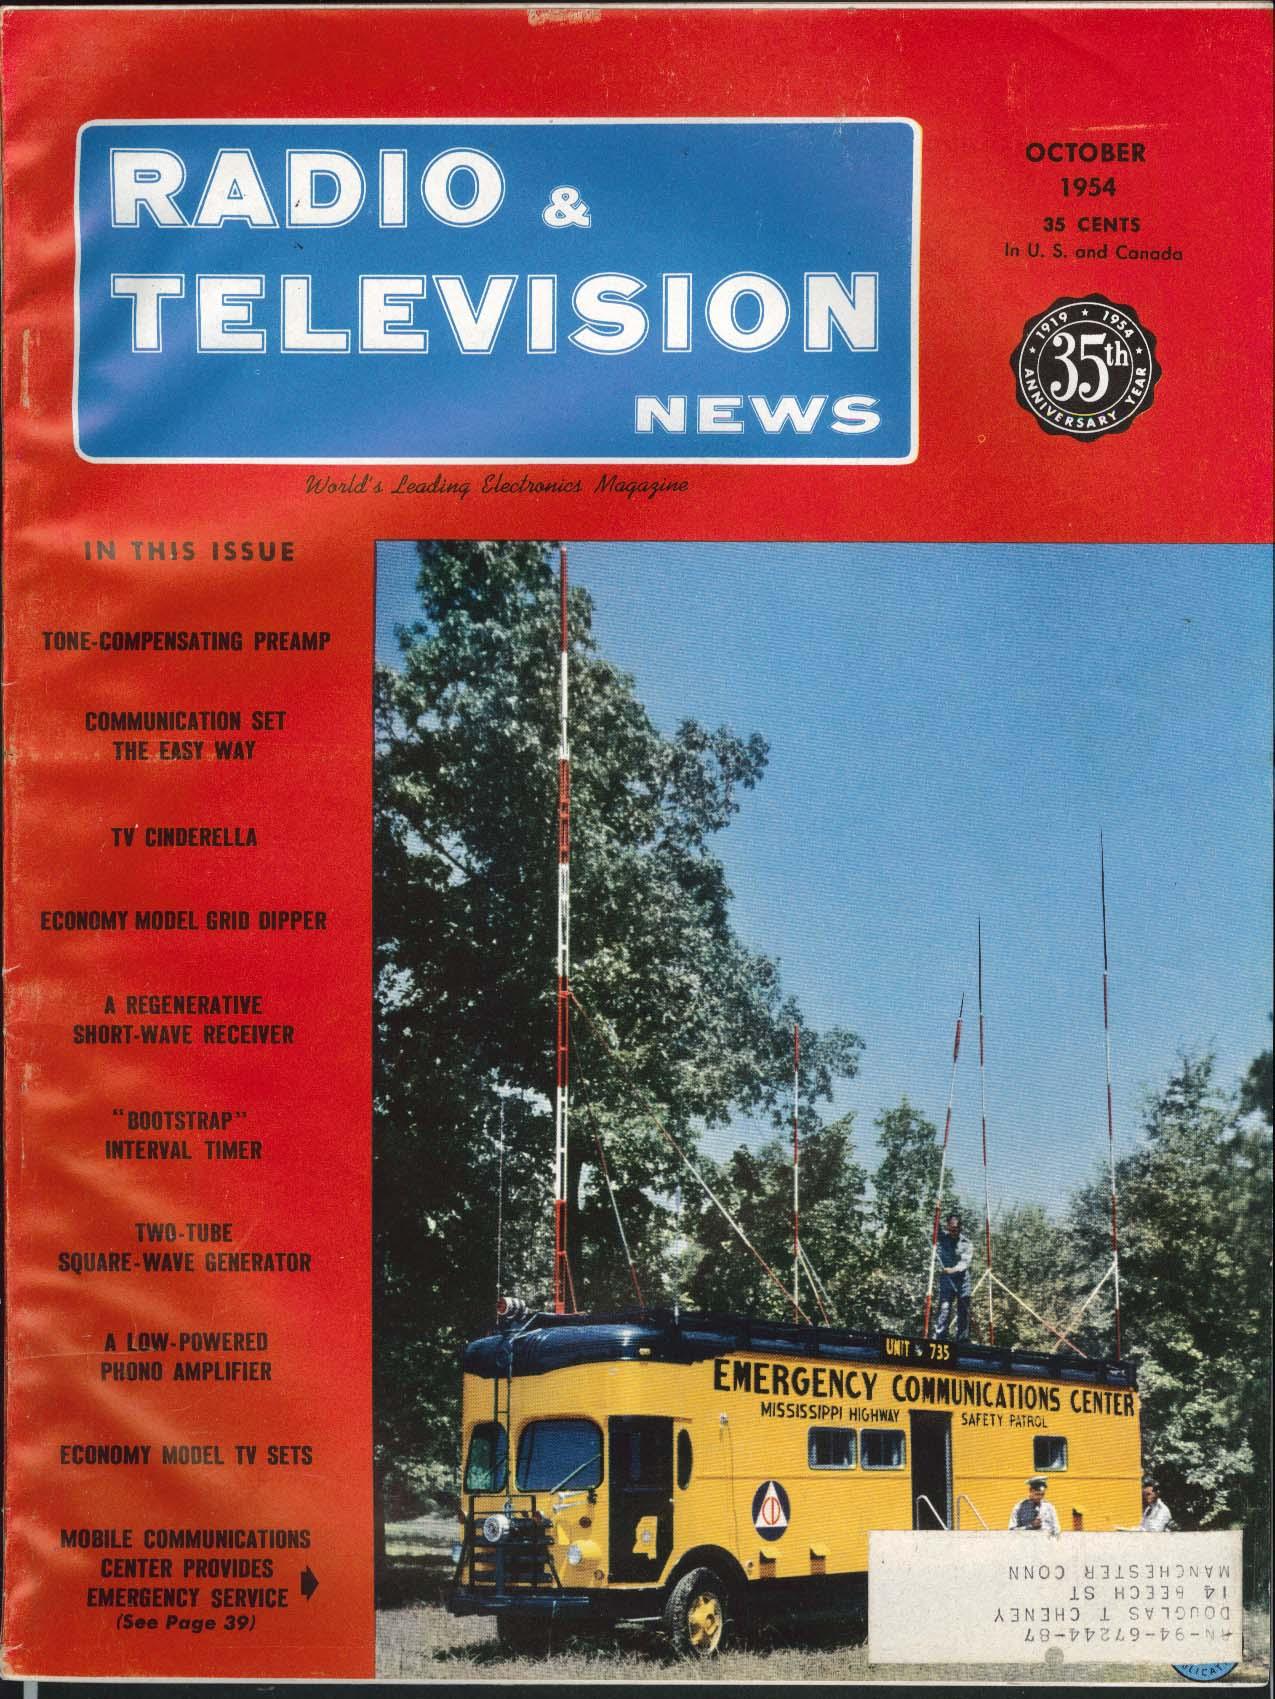 RADIO & TELEVISION NEWS Tone-Compensating Preamp Economy Model TV Sets 10 1954